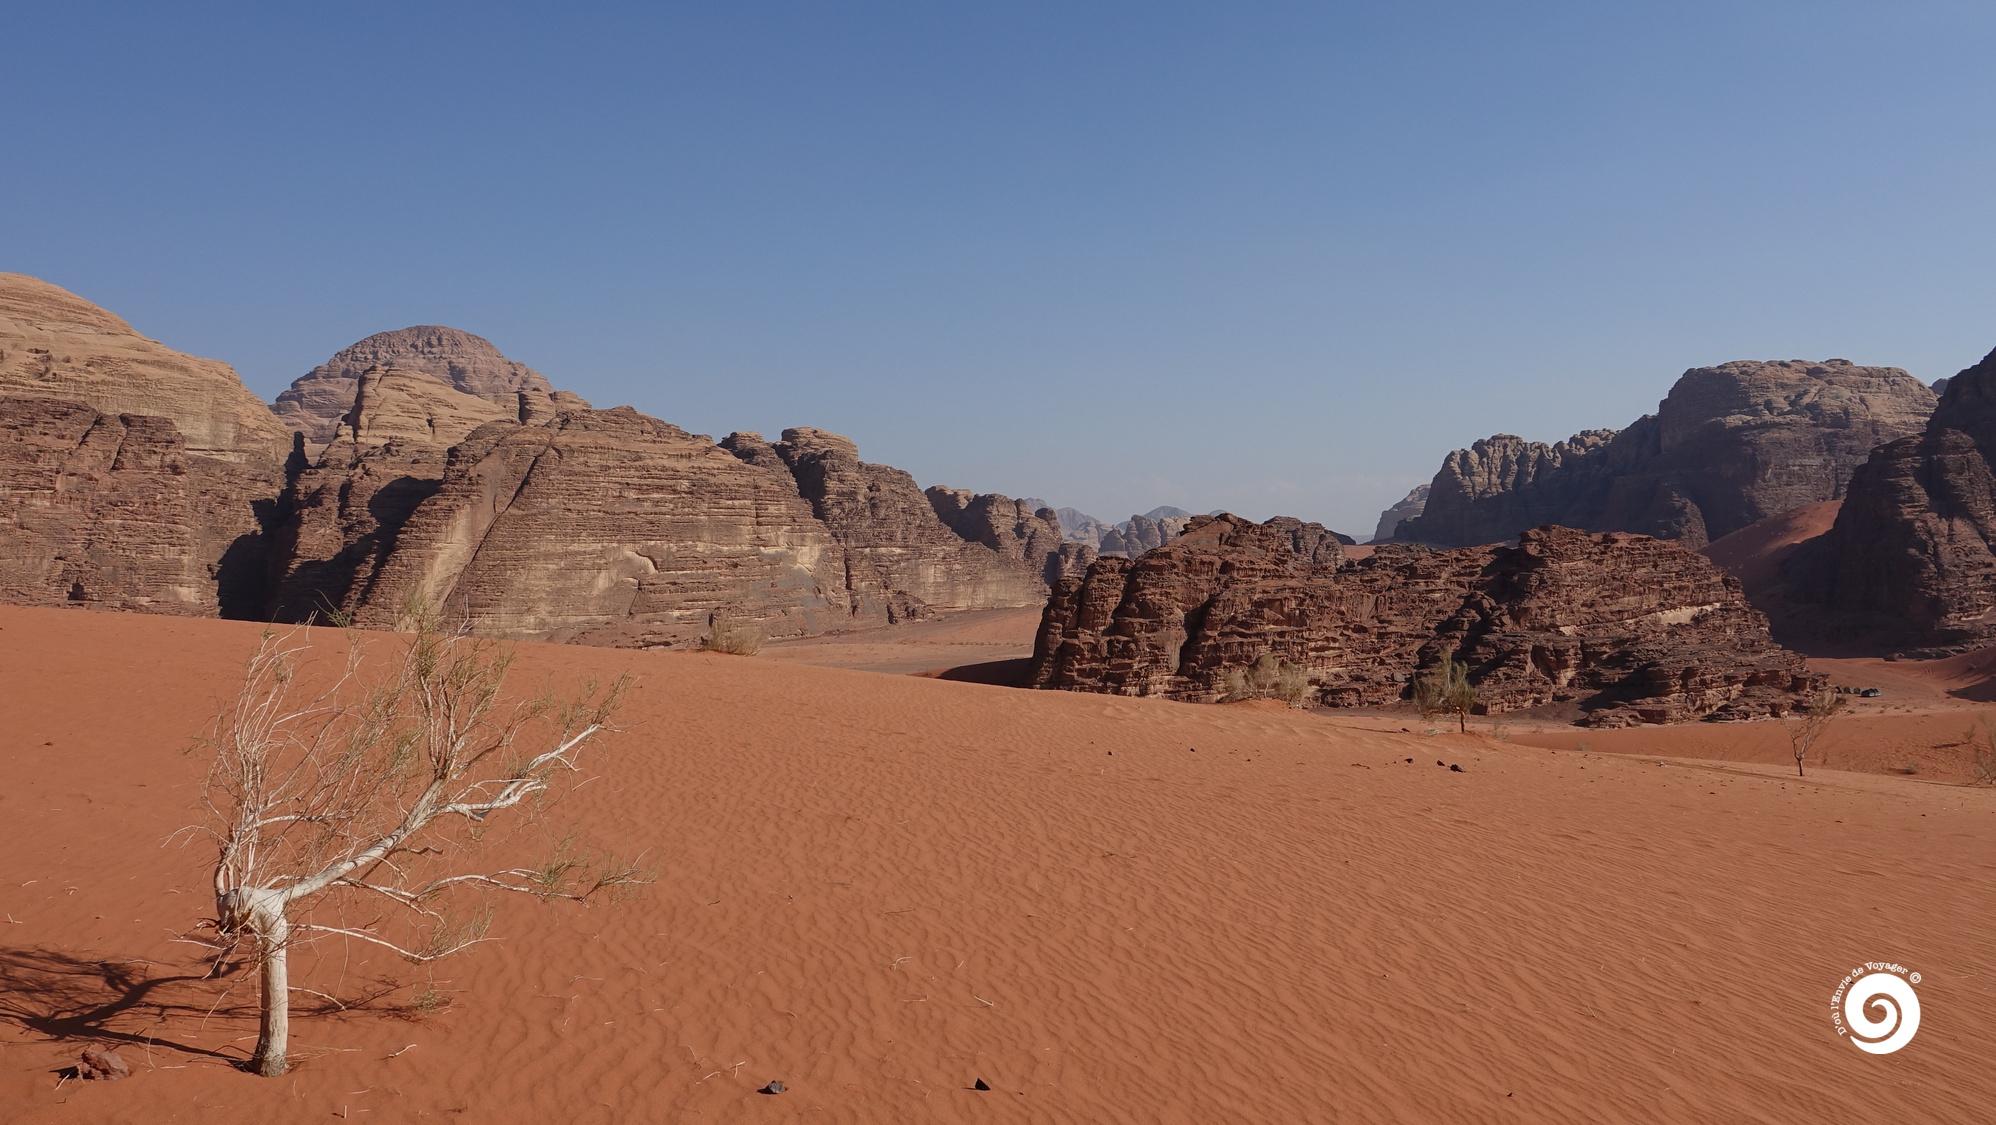 D'où l'Envie de Voyager - Wadi rum